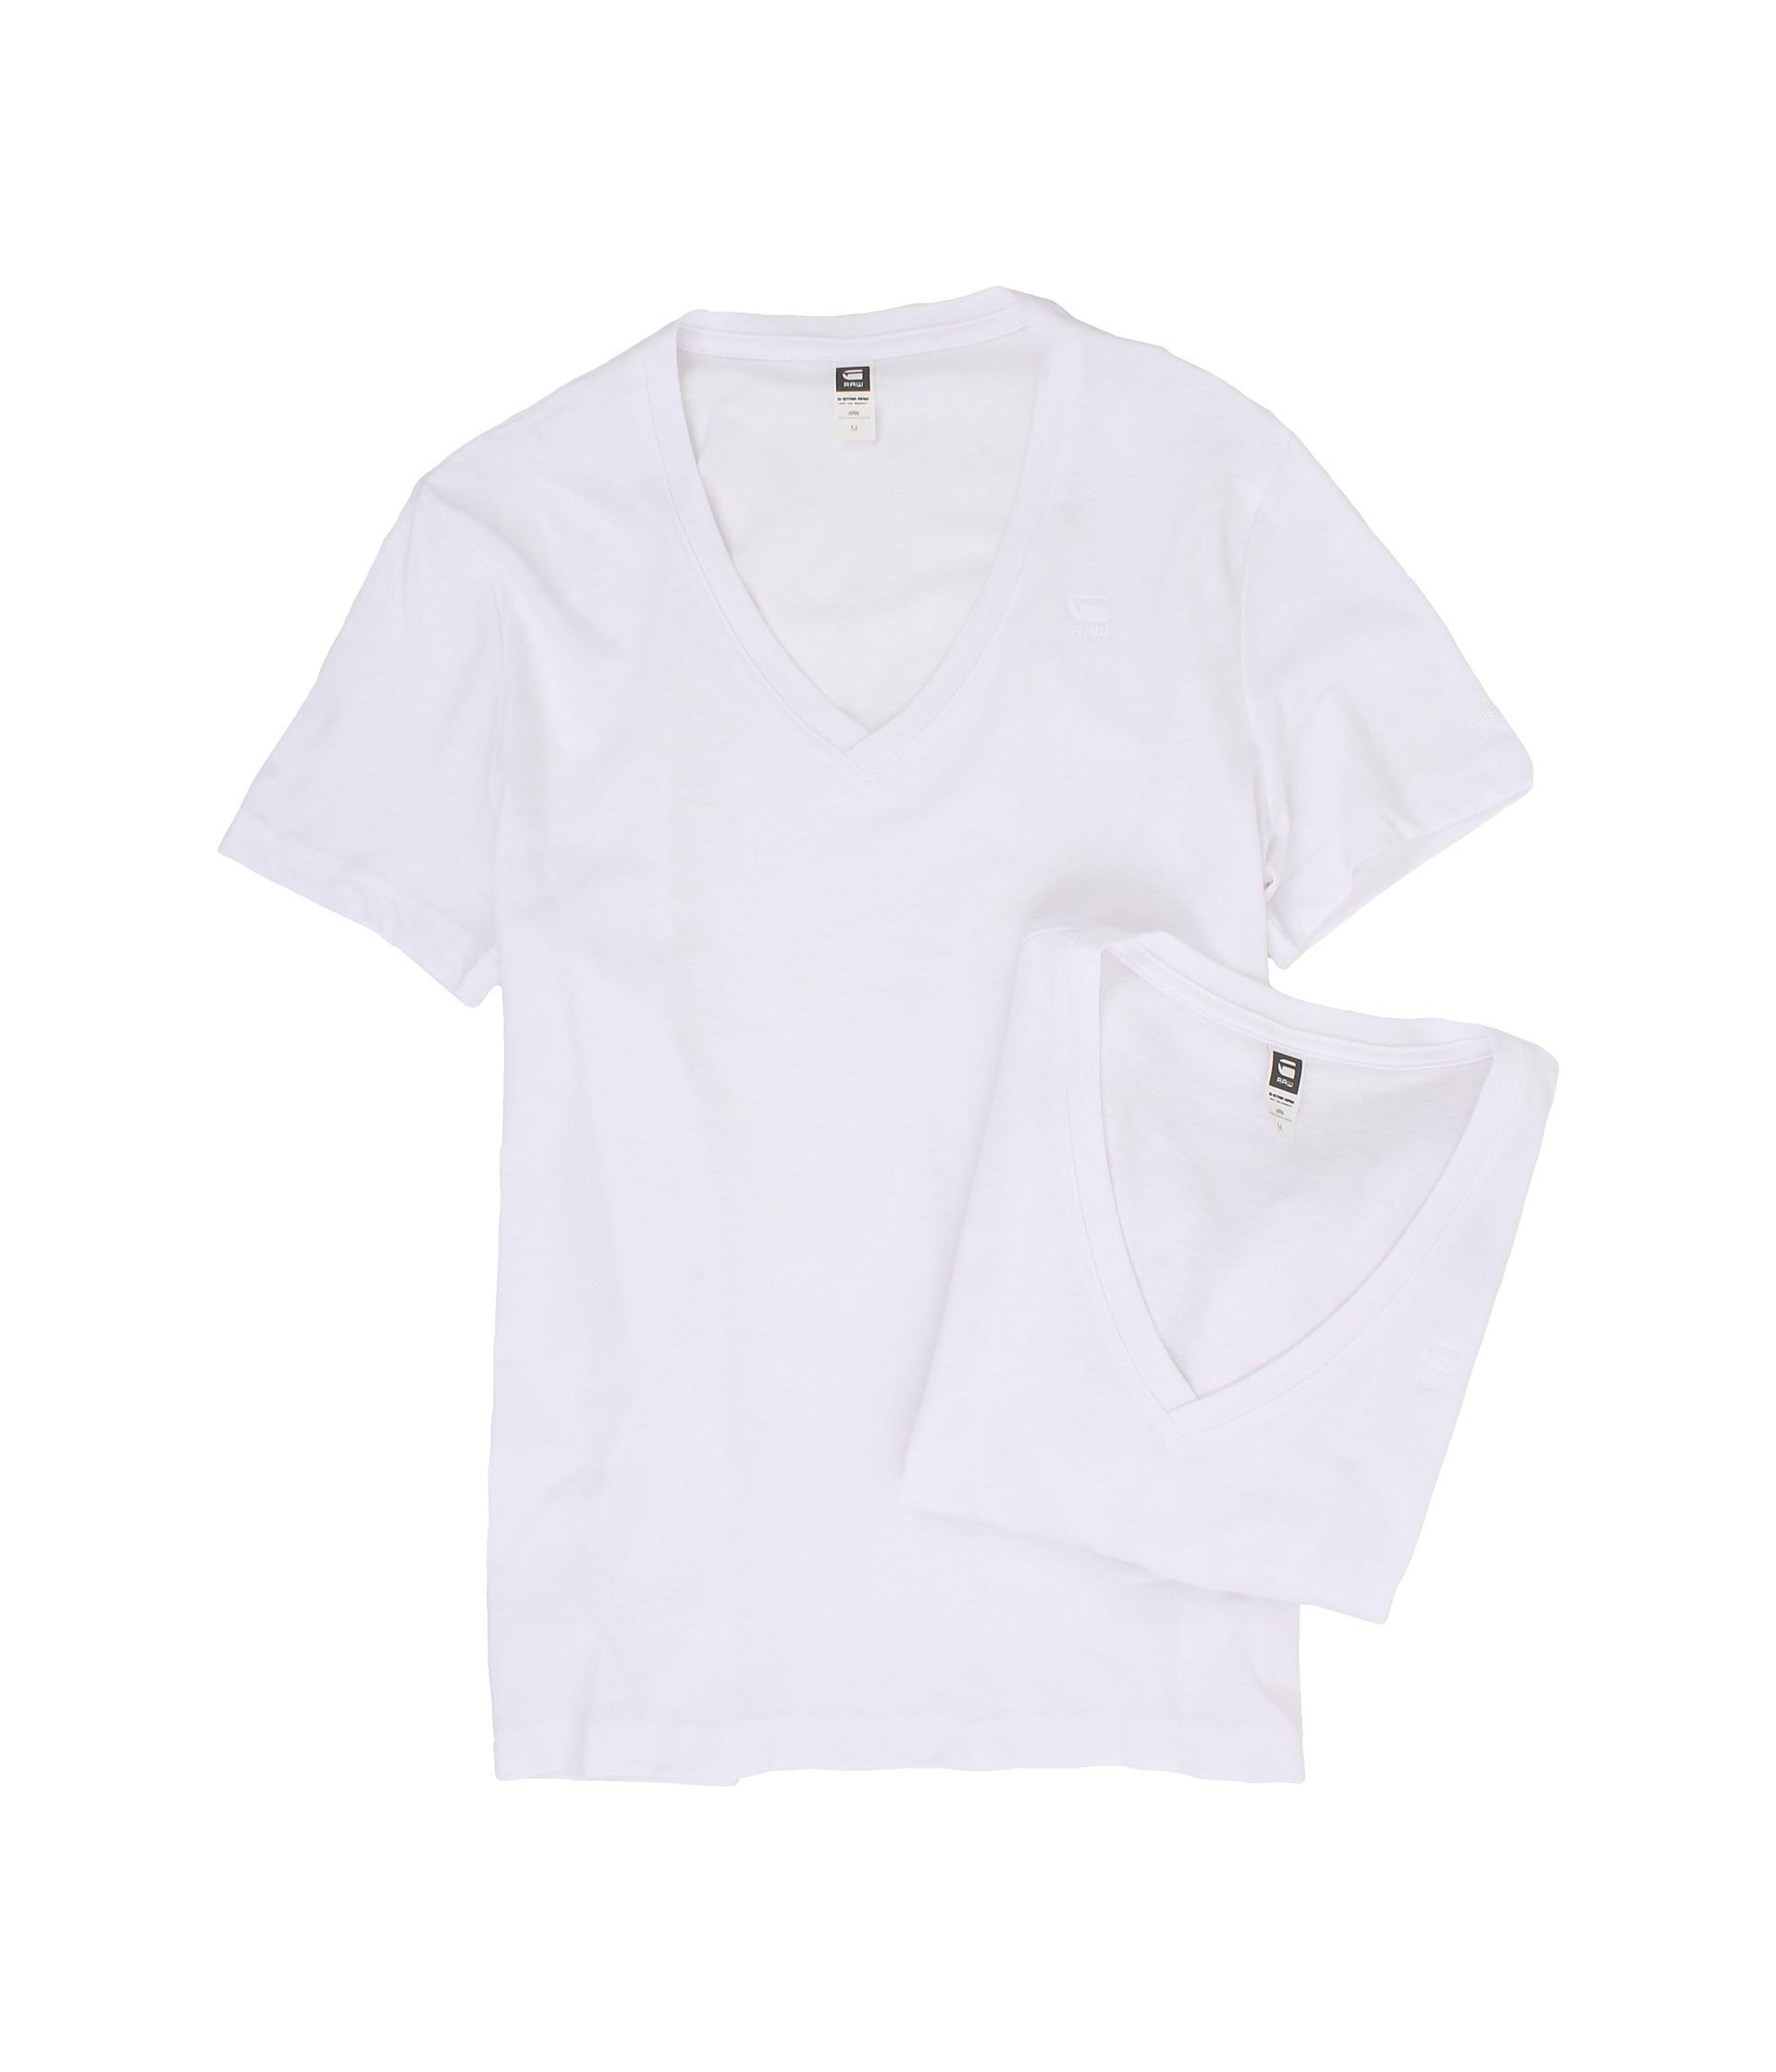 Base Round Neck T-Shirt G-Star 8TxPIGaHOx